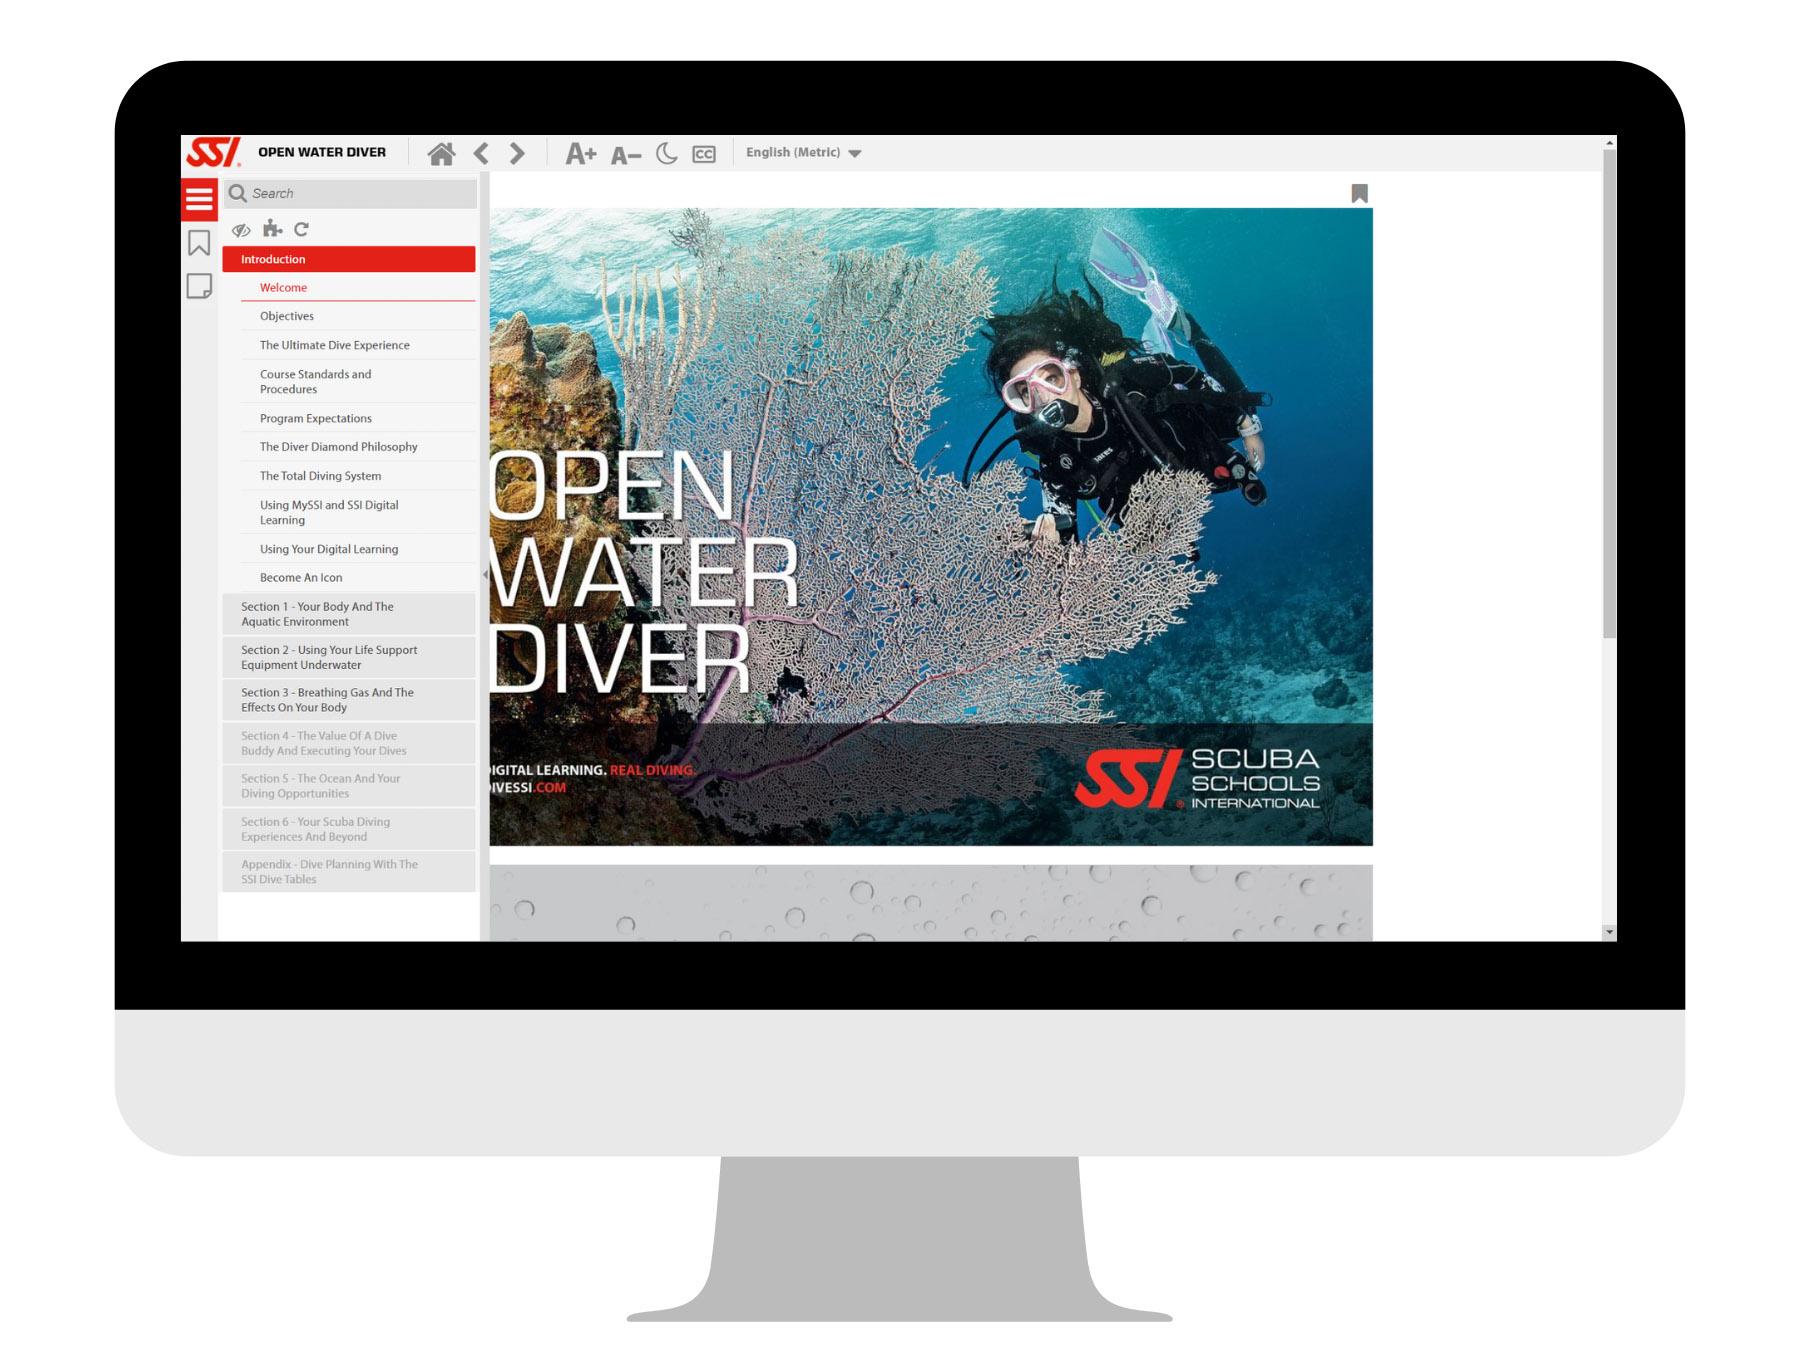 Scuba 2000 - MySSI - SSI Open Water Diver